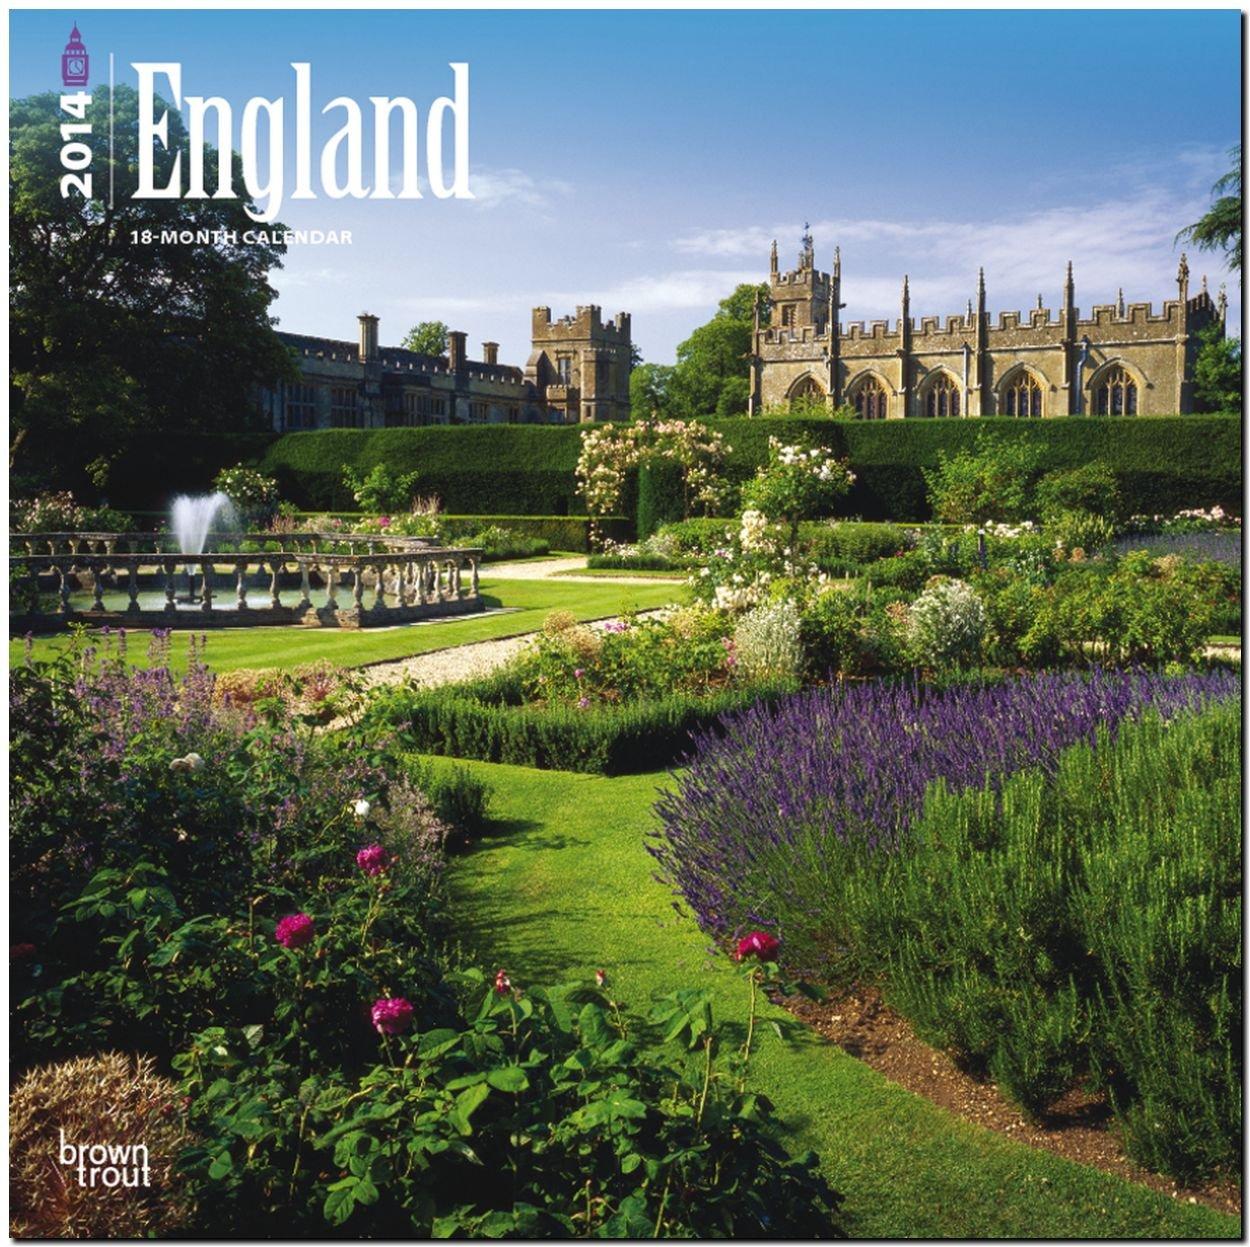 England 2014: Original BrownTrout-Kalender [Mehrsprachig] [Kalender]